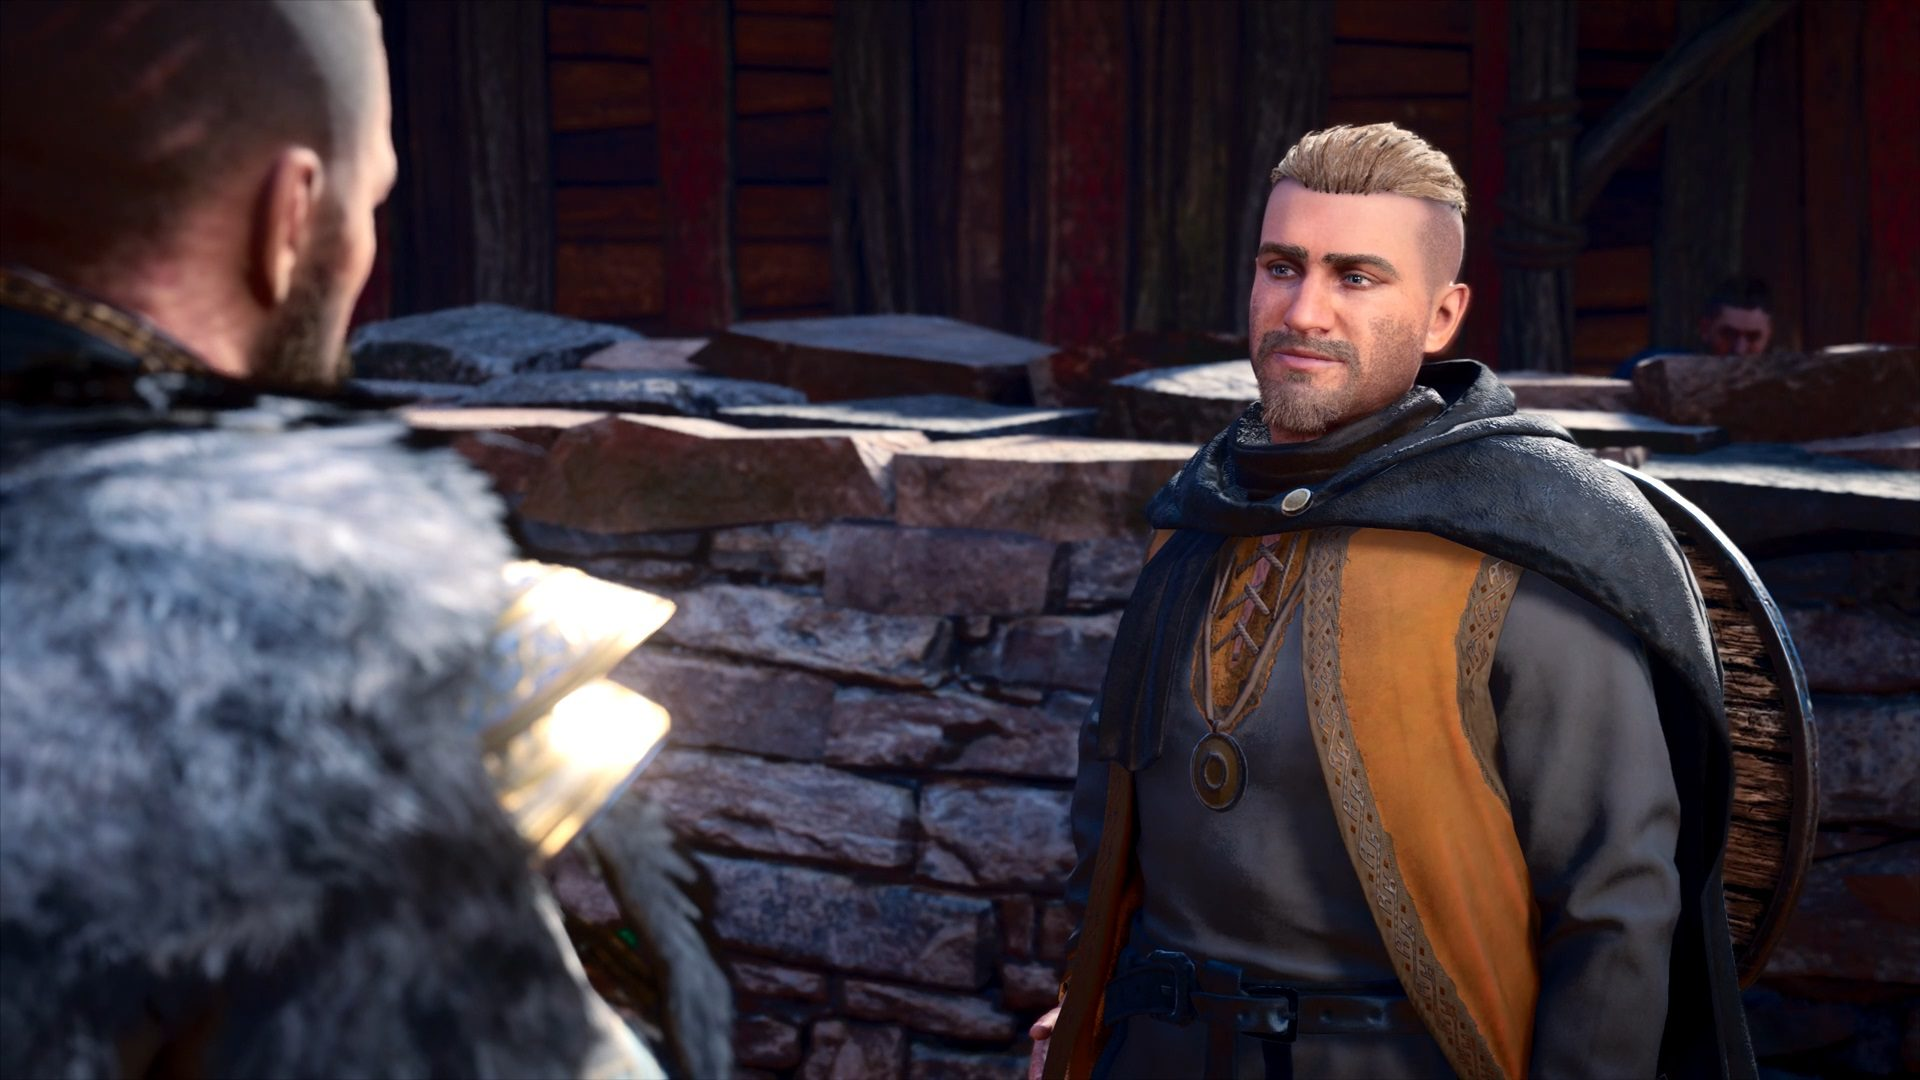 Assassin's Creed Valalla Stigr The Amorou Flyting Answers